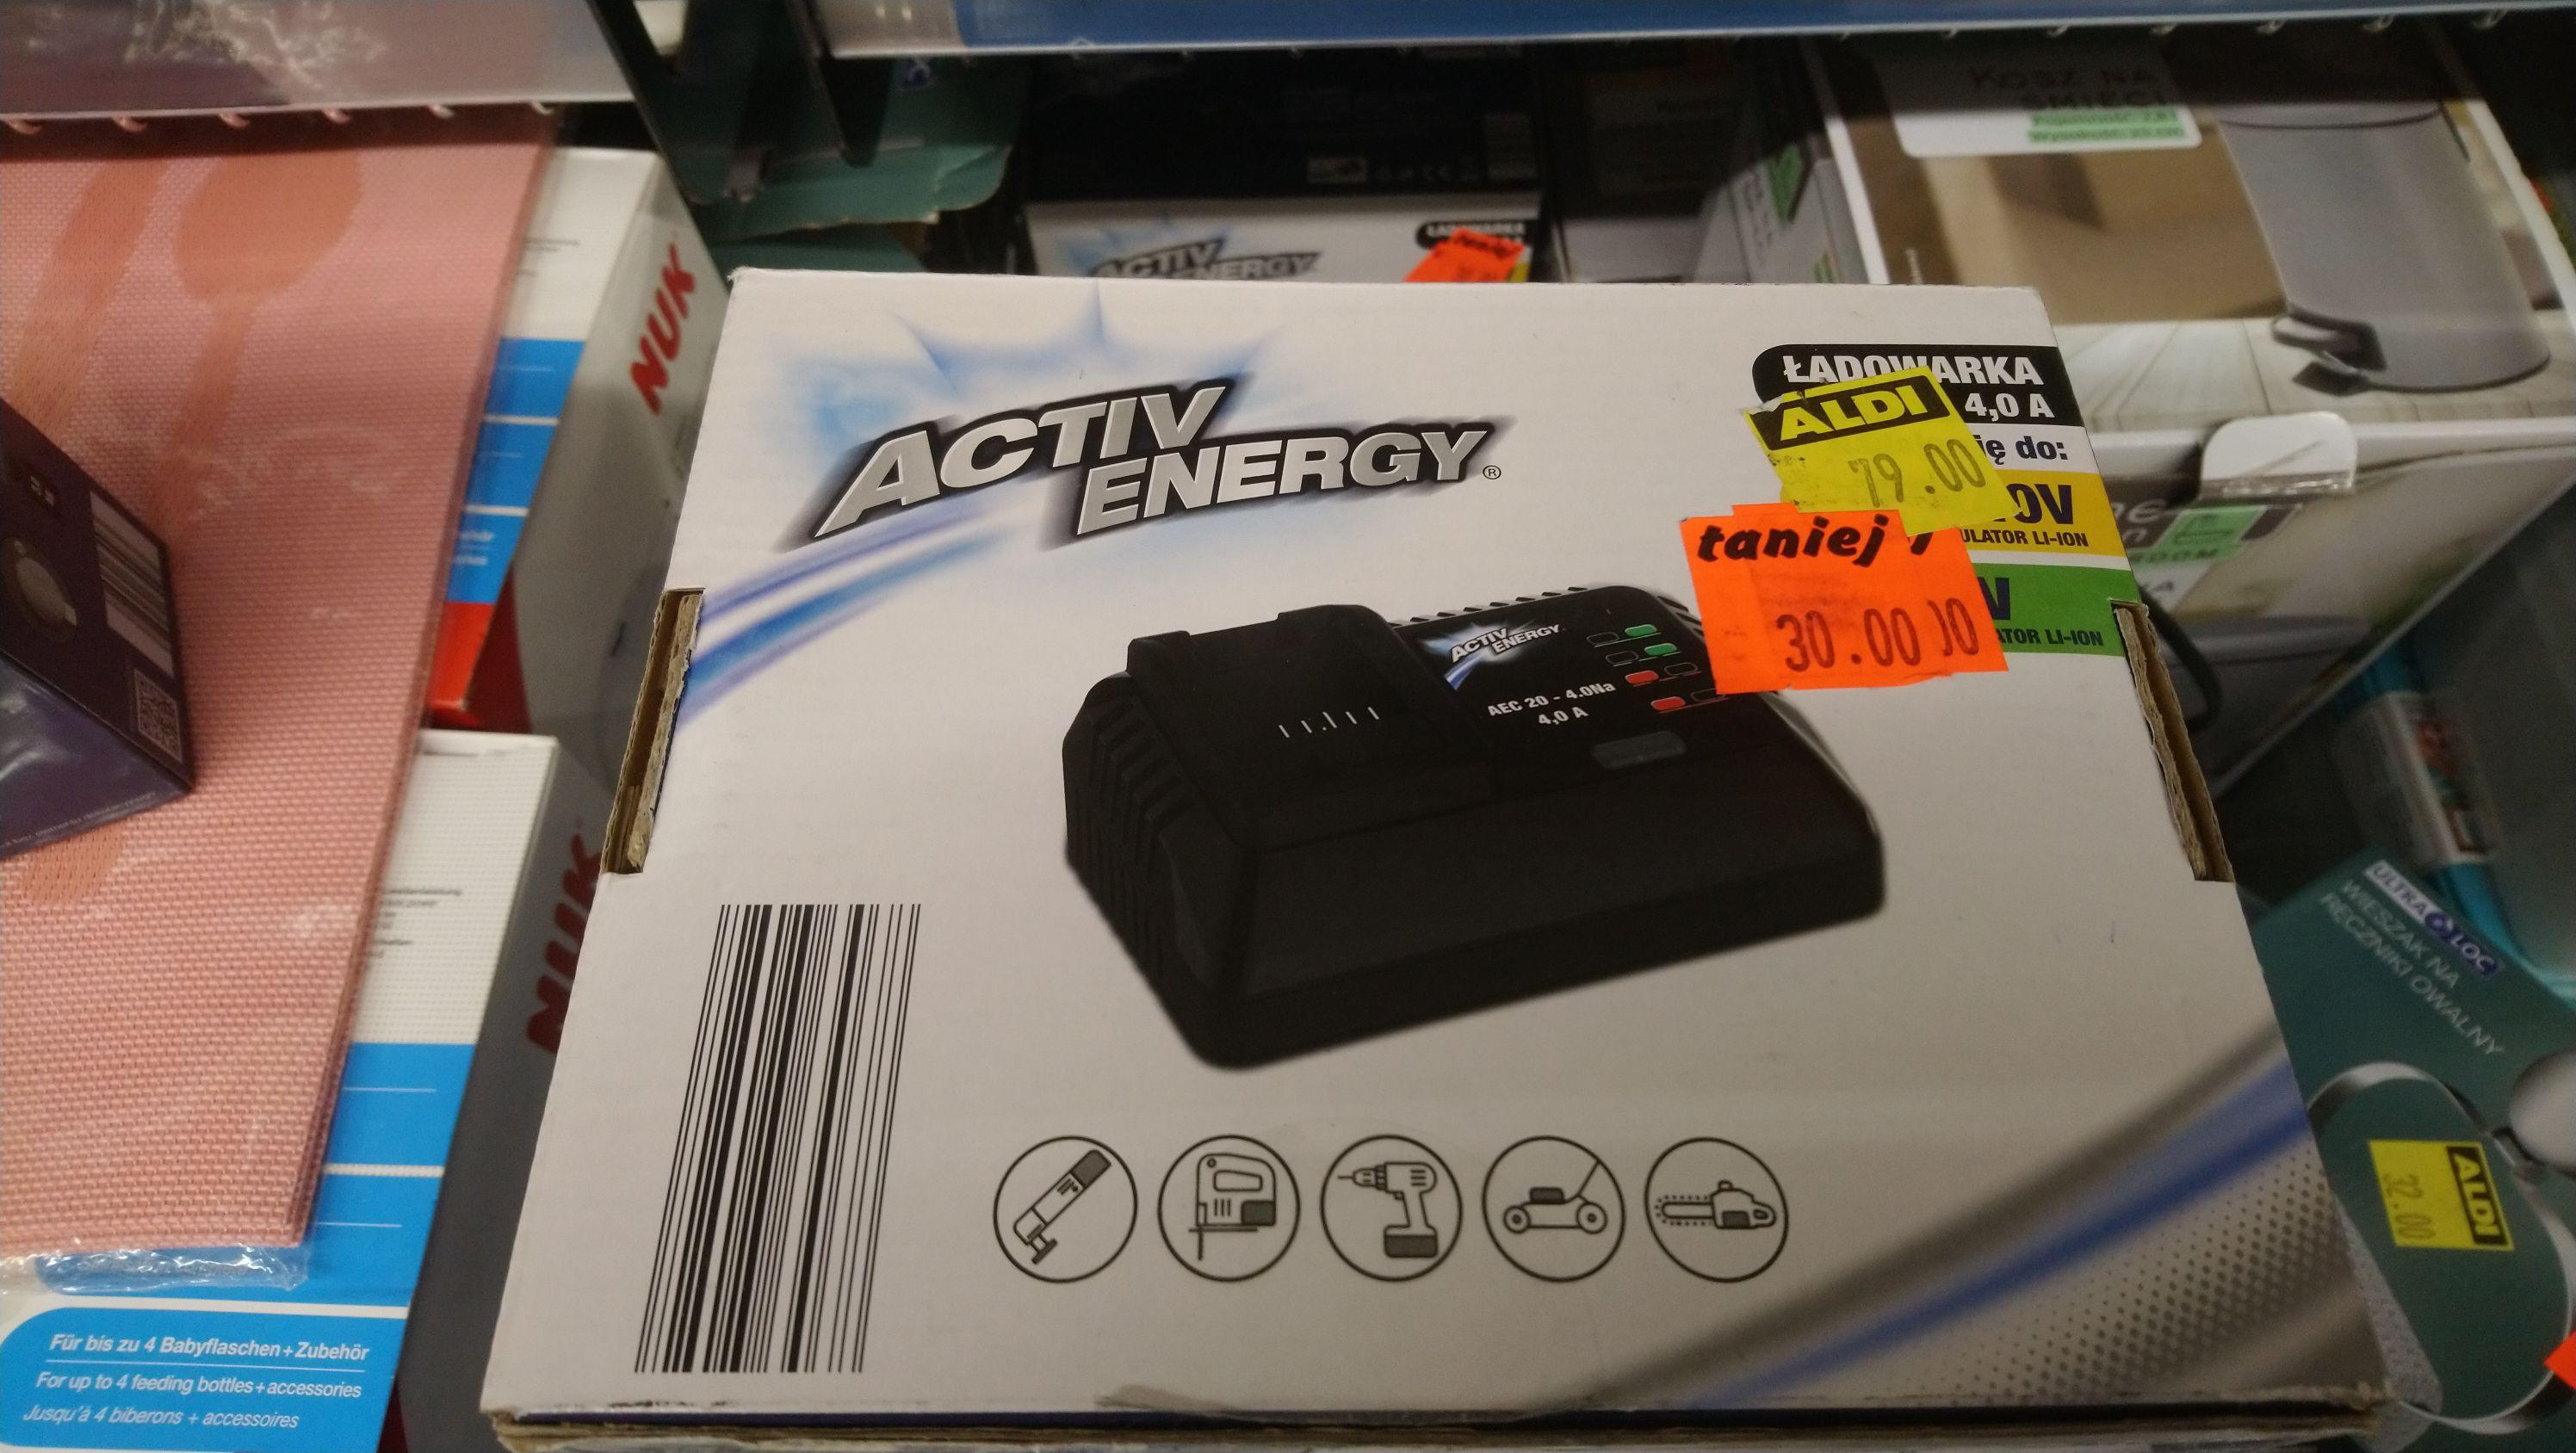 Ładowarka Activ Energy 4.0 A 20/40V Aldi Siemianowice Śląskie